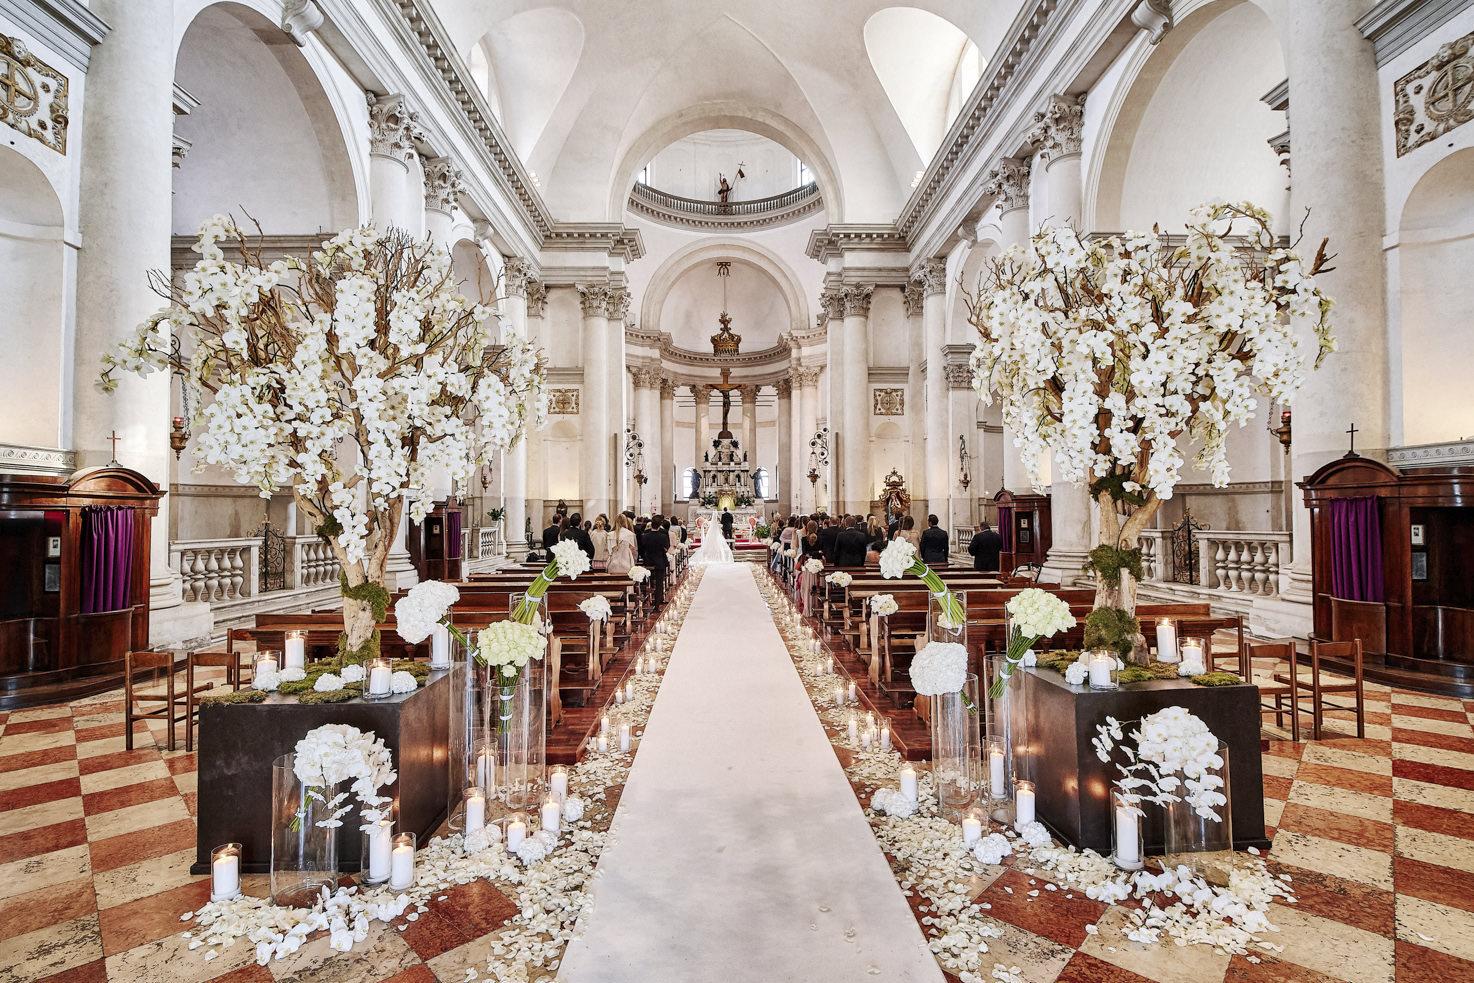 Catholic wedding at Basilica del Redentore